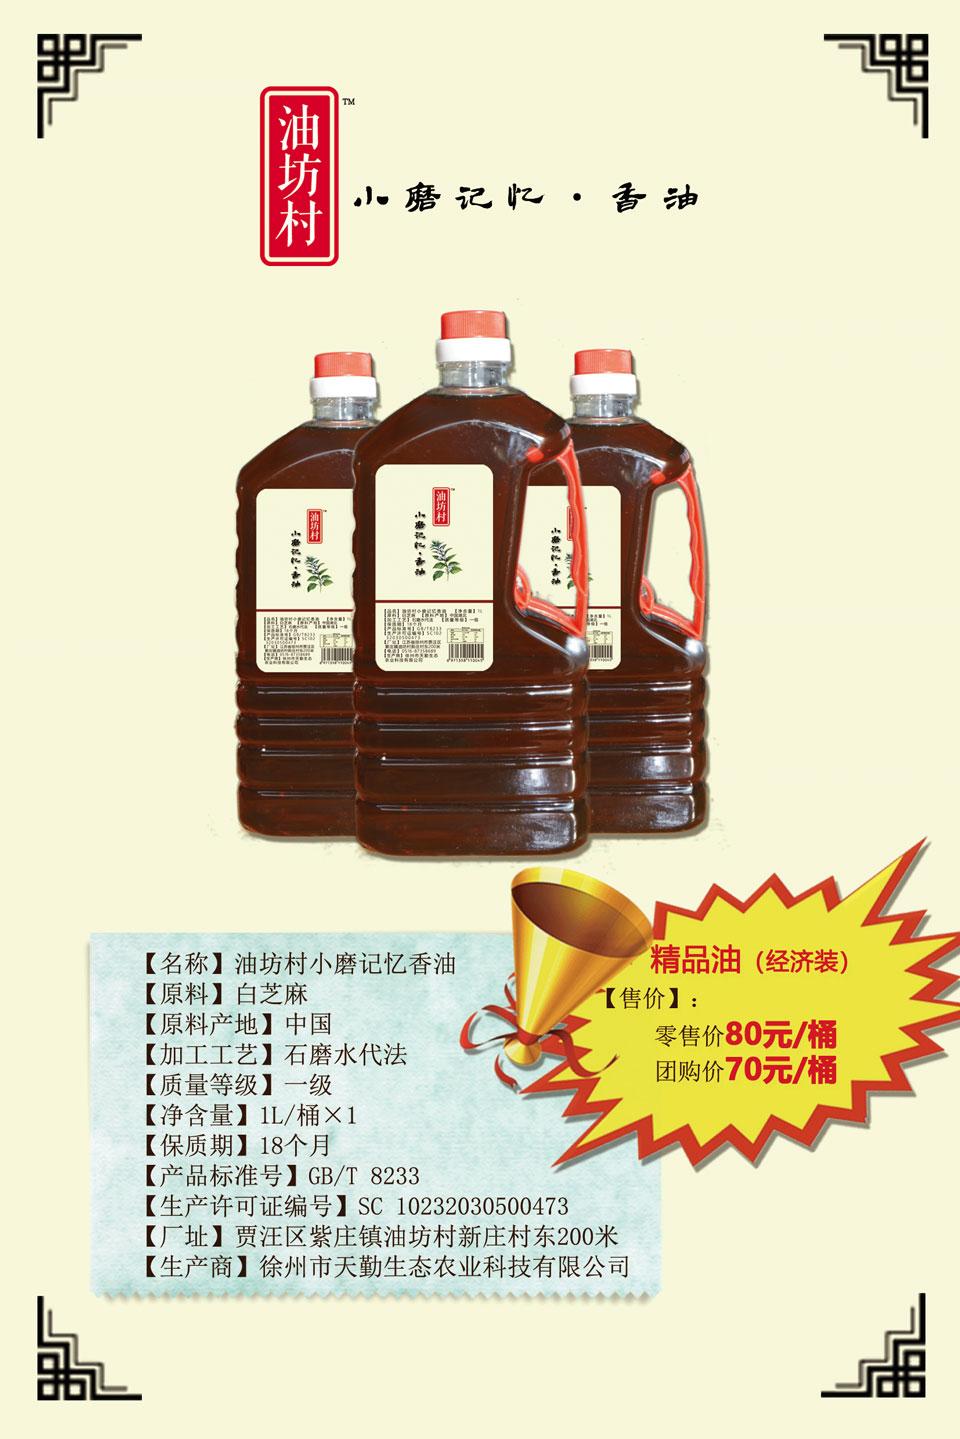 chun芝麻油-徐州哪里有划算的徐州te产香油供应